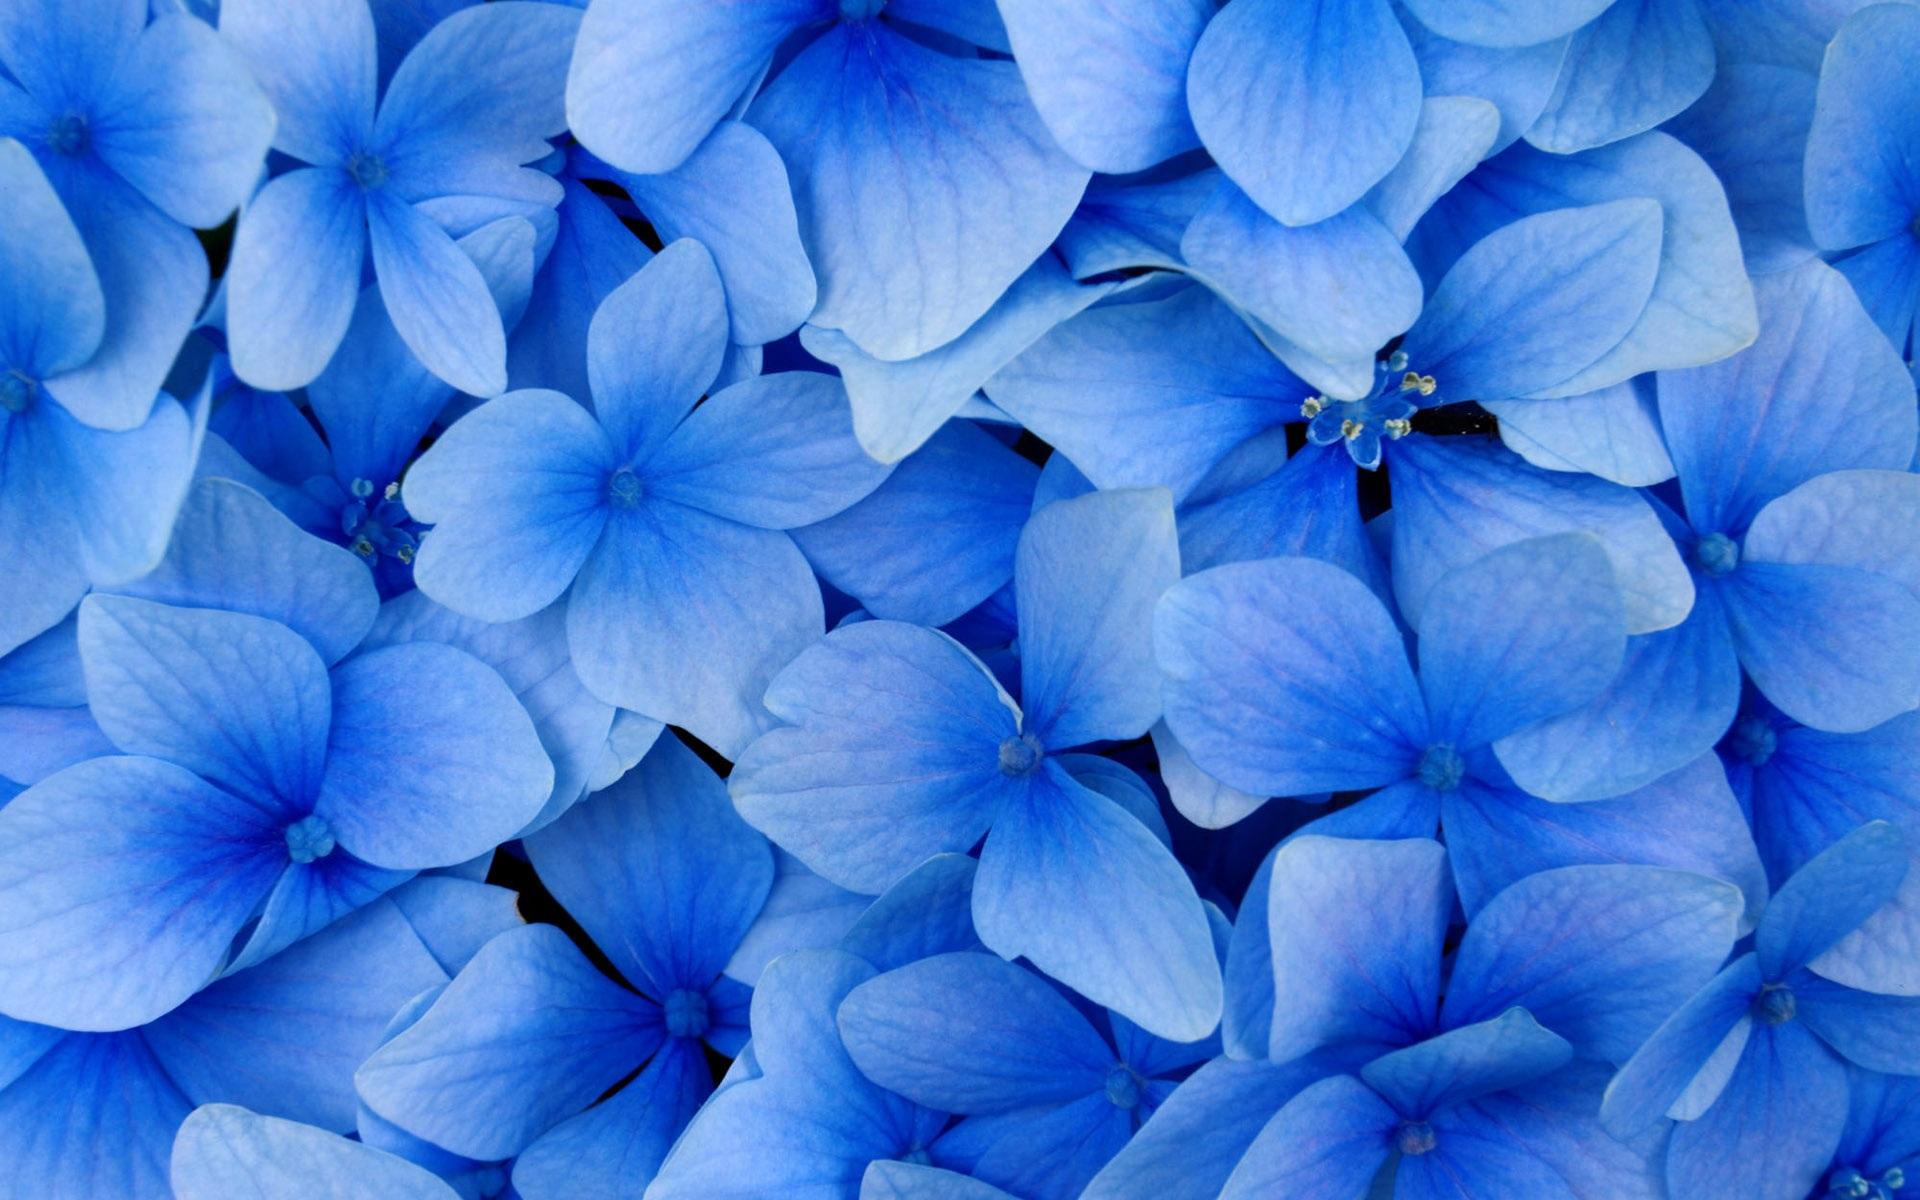 Hintergrundbilder Blaue Blume: 桌布 藍色花 1920x1200 HD 高清桌布, 圖片, 照片